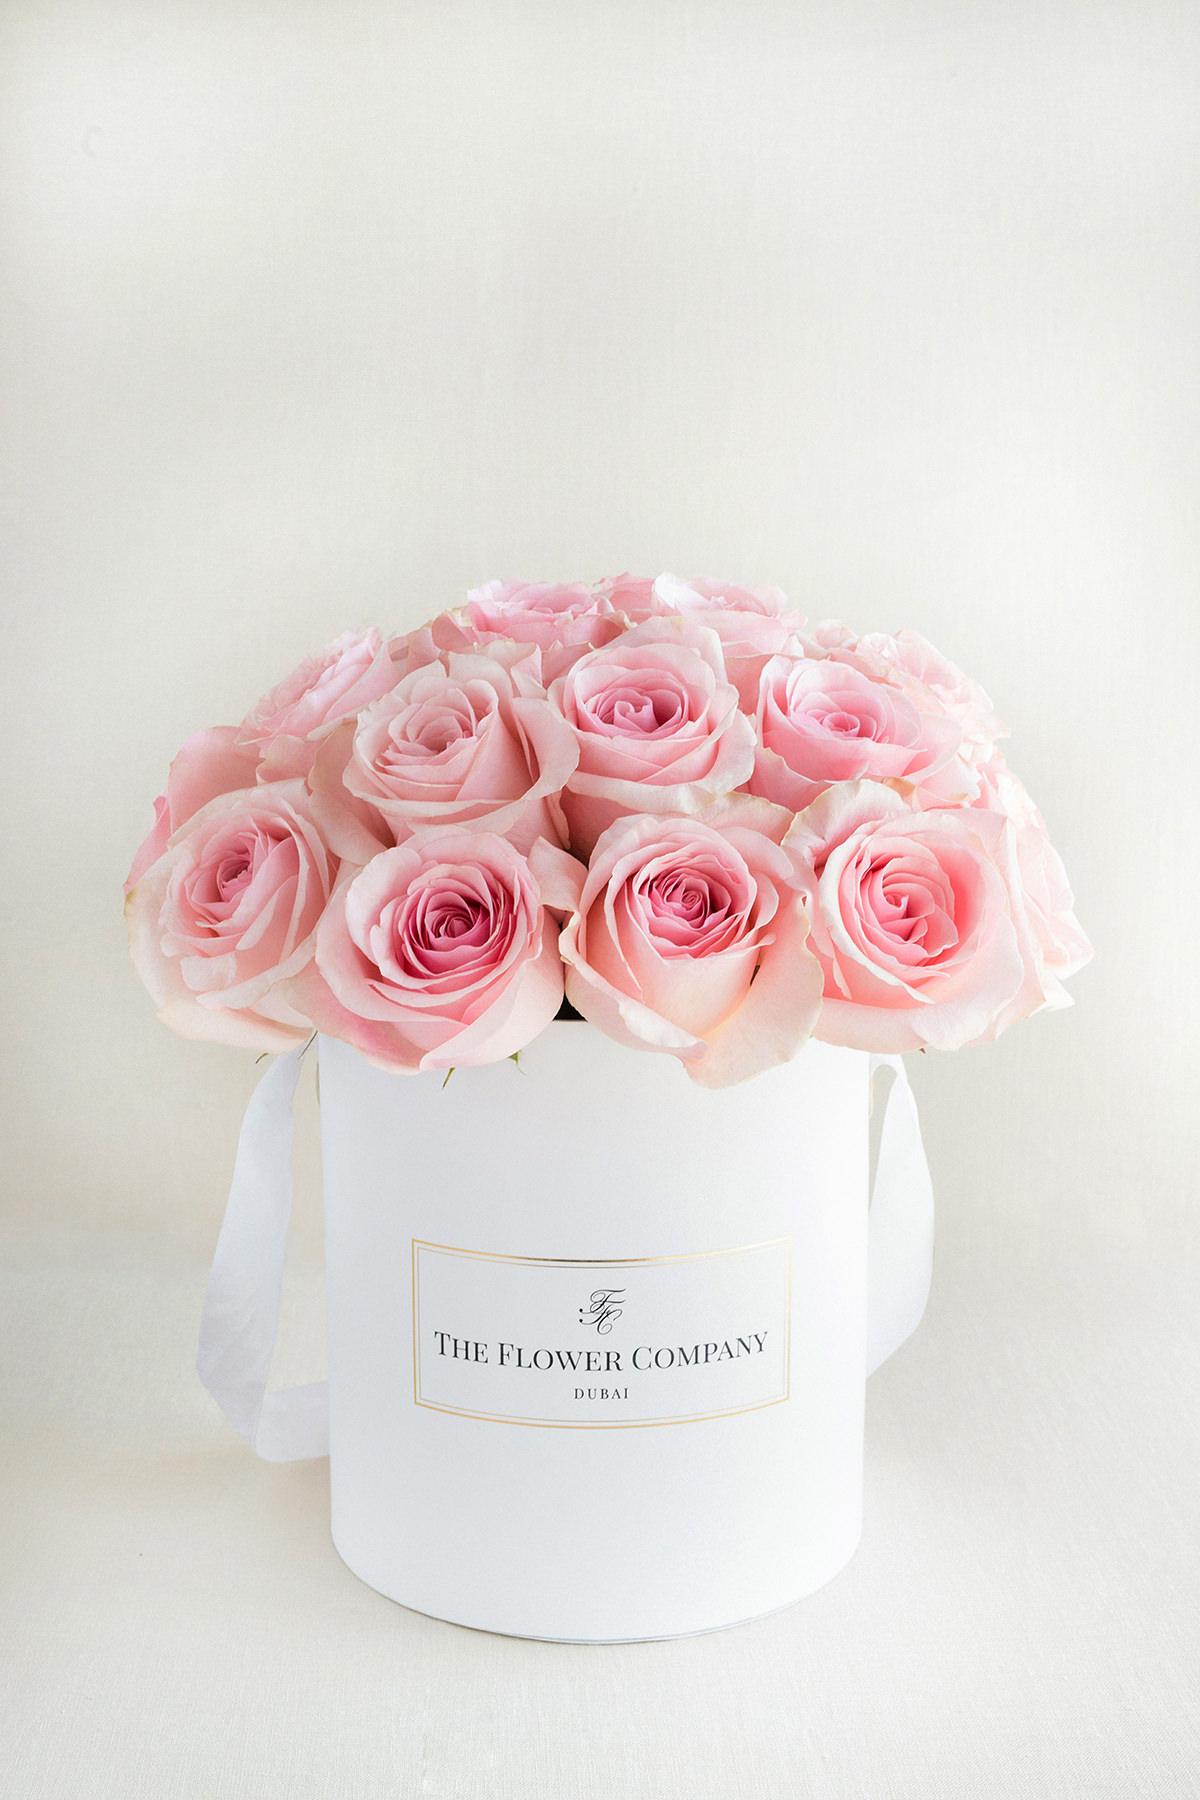 The Flower Company Dubai